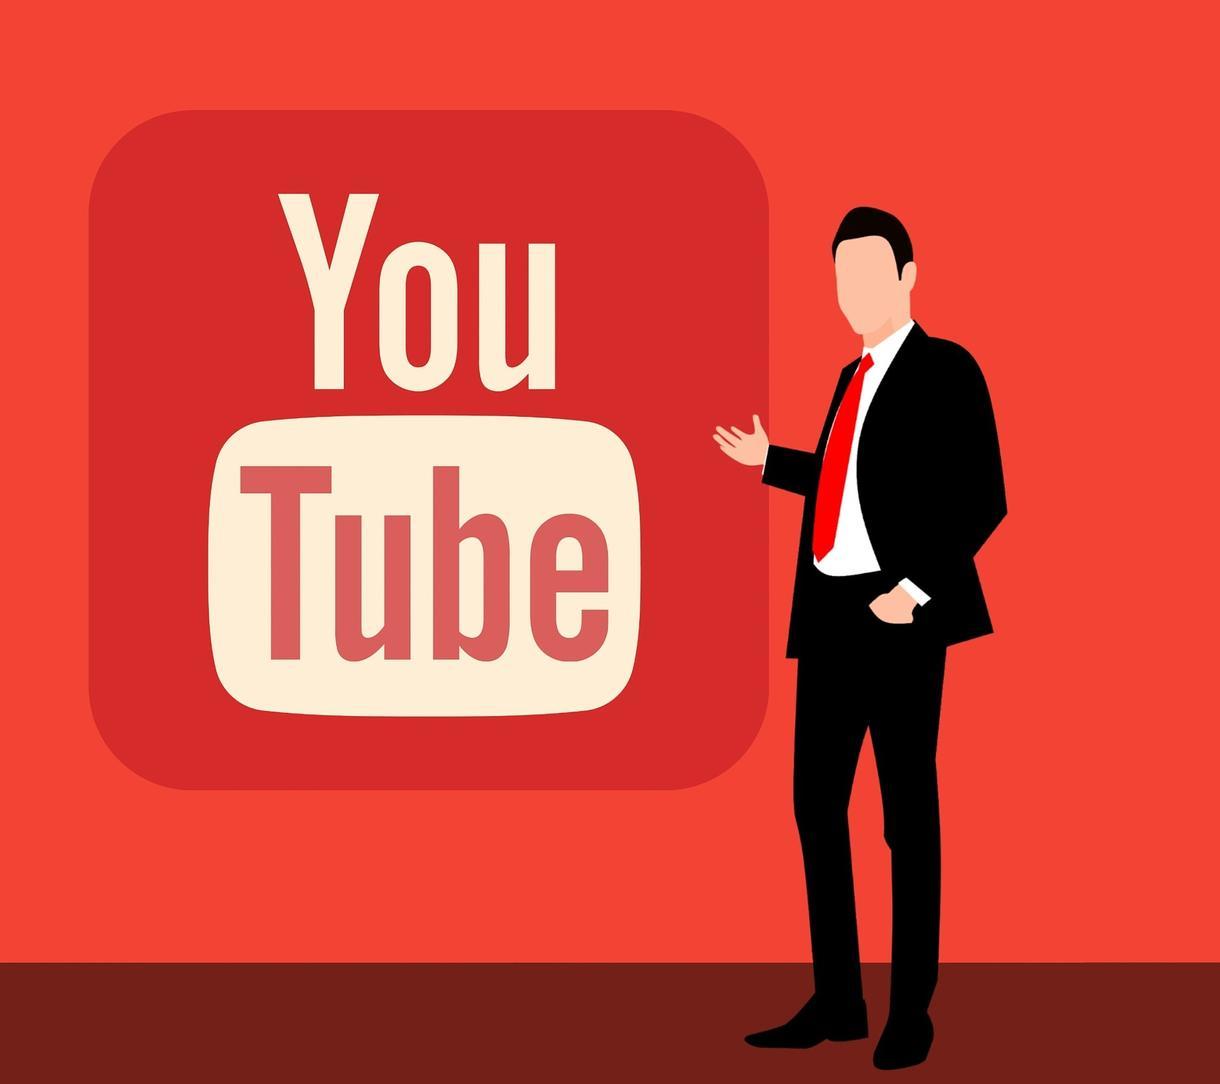 YouTubeや宴会用等の動画編集します 【ココナラ出品者駆け出しのため、単価安め納品早めです!】